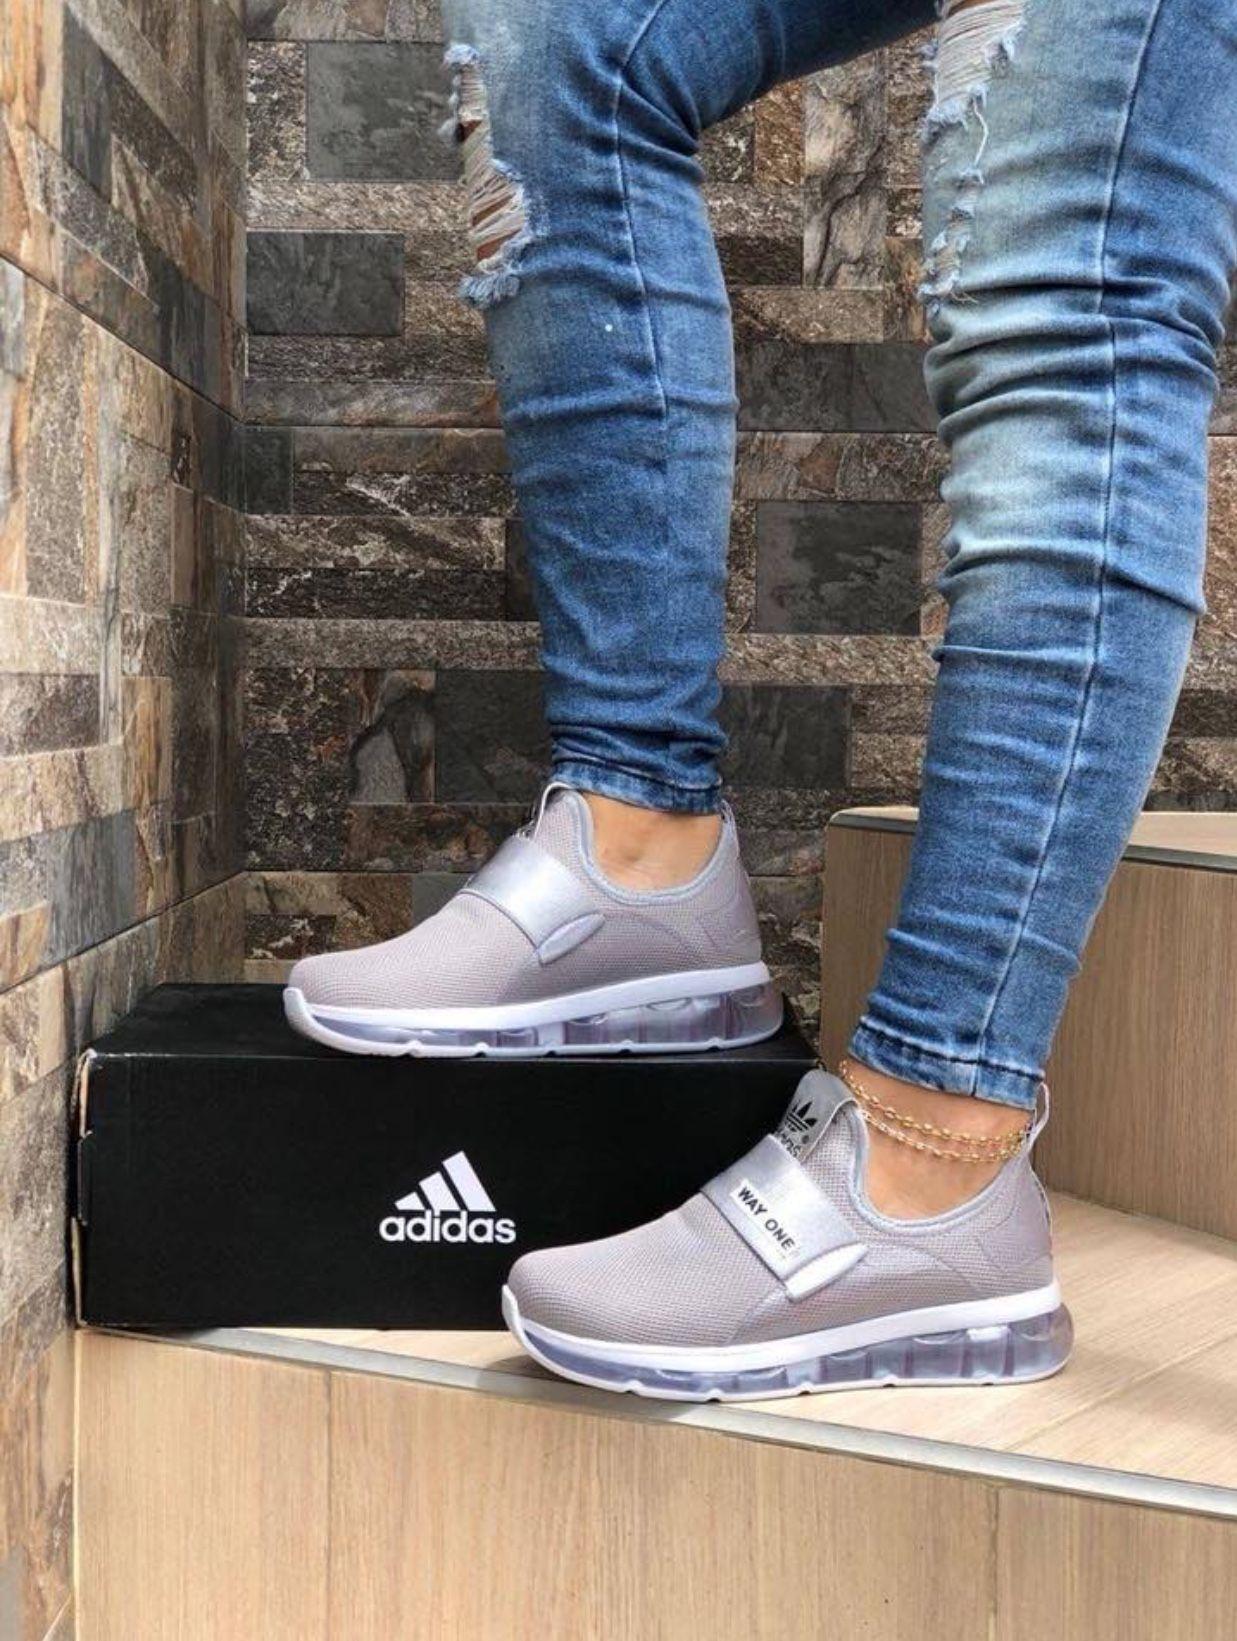 meet b7cf9 79fdc Zapatos Casuales, Zapatos Bonitos, Zapatos De Moda, Calzado Mujer, Zapatos  Nike Mujer